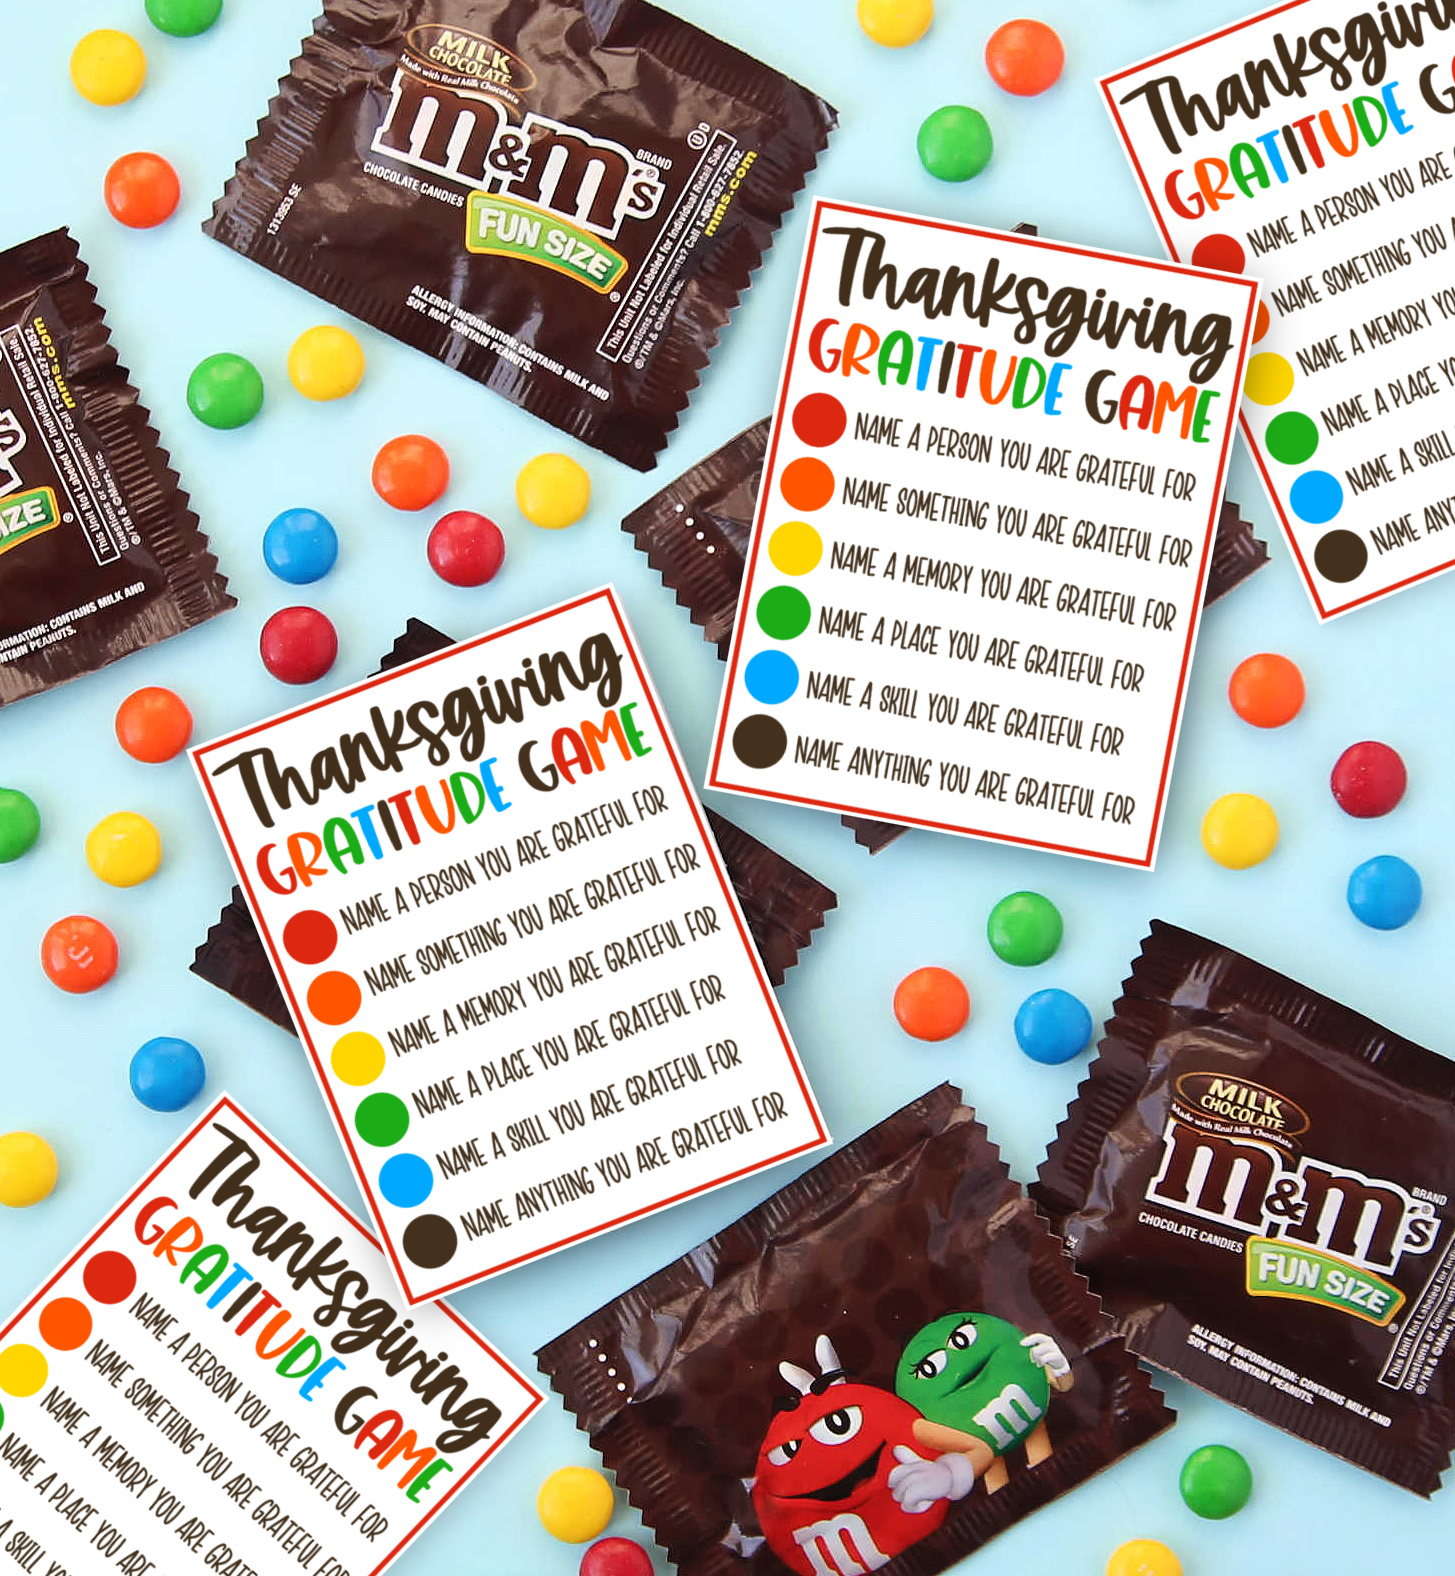 Thanksgiving Gratitude Game Free Printable